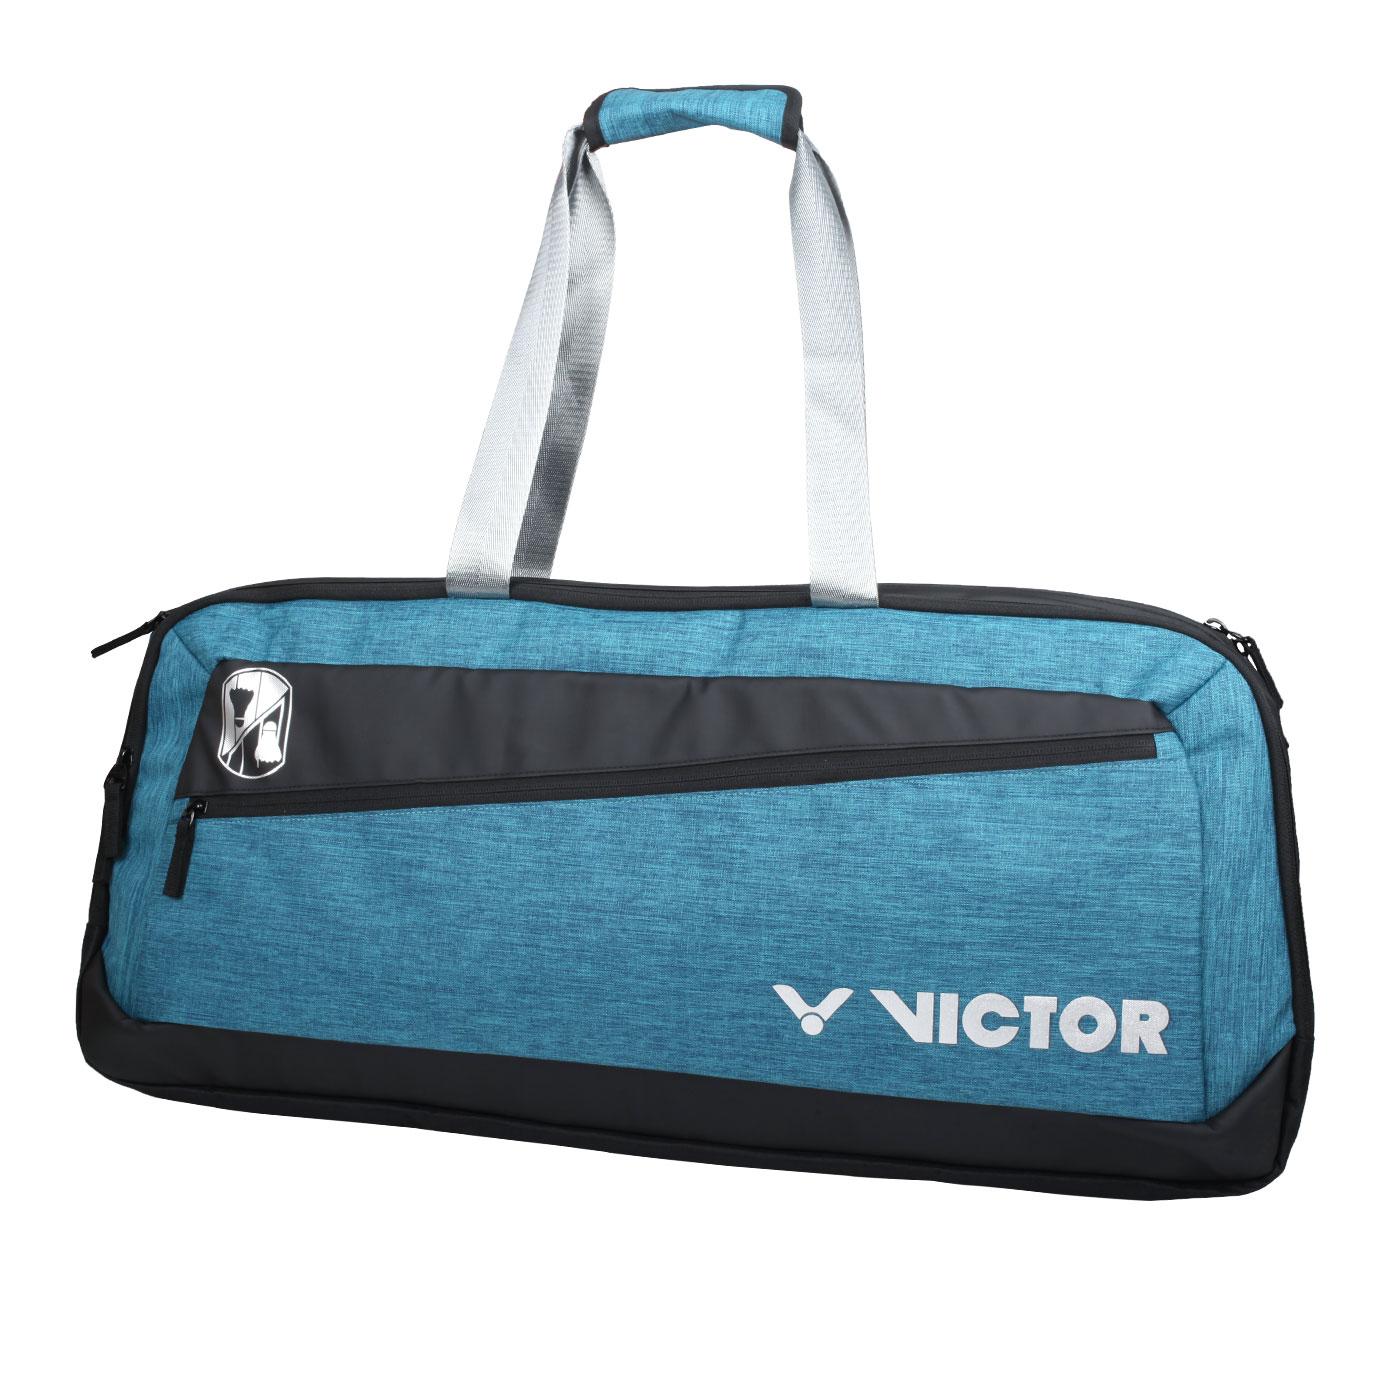 VICTOR 6支裝矩形包 BR3622FC - 墨藍黑銀